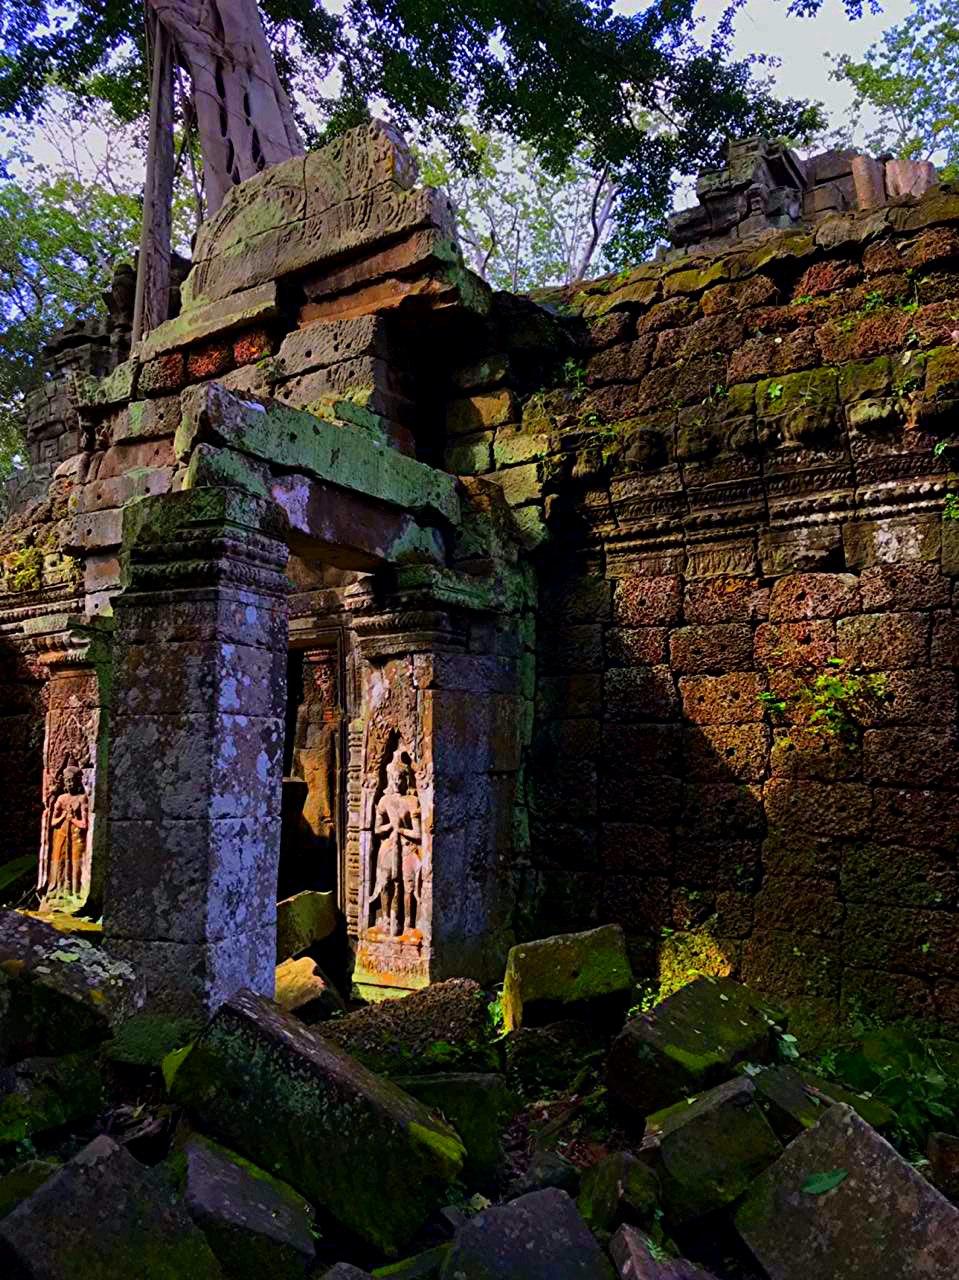 Елена Руденко (Валтея). Камбоджа. Ангкор. - Страница 2 26oOnhY91Rk